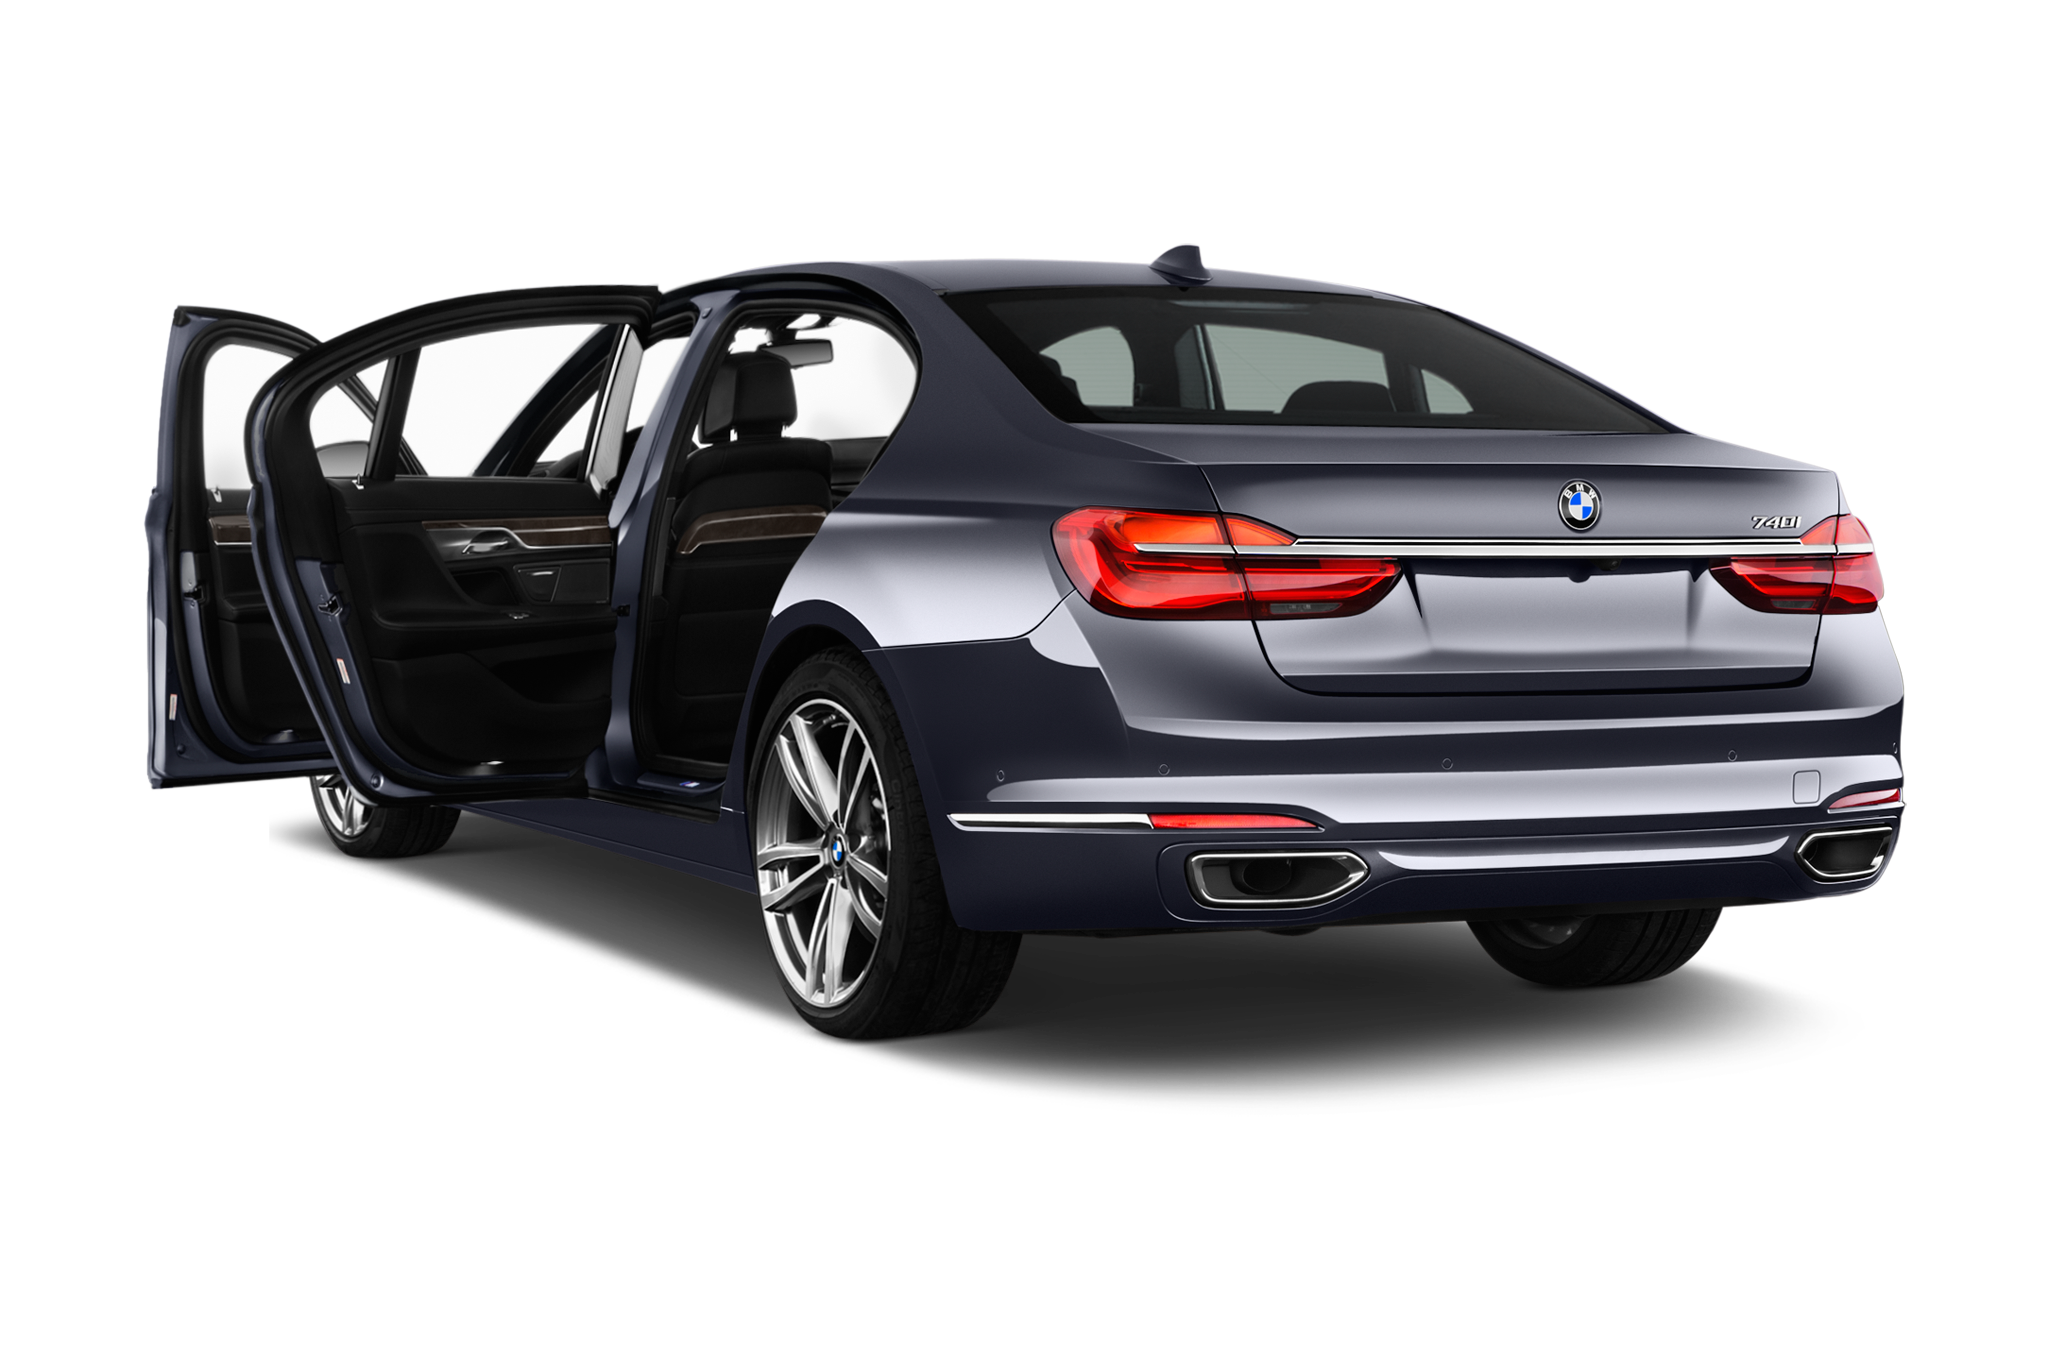 2017 bmw alpina b7 xdrive is a 600 hp 193 mph luxury sedan. Black Bedroom Furniture Sets. Home Design Ideas